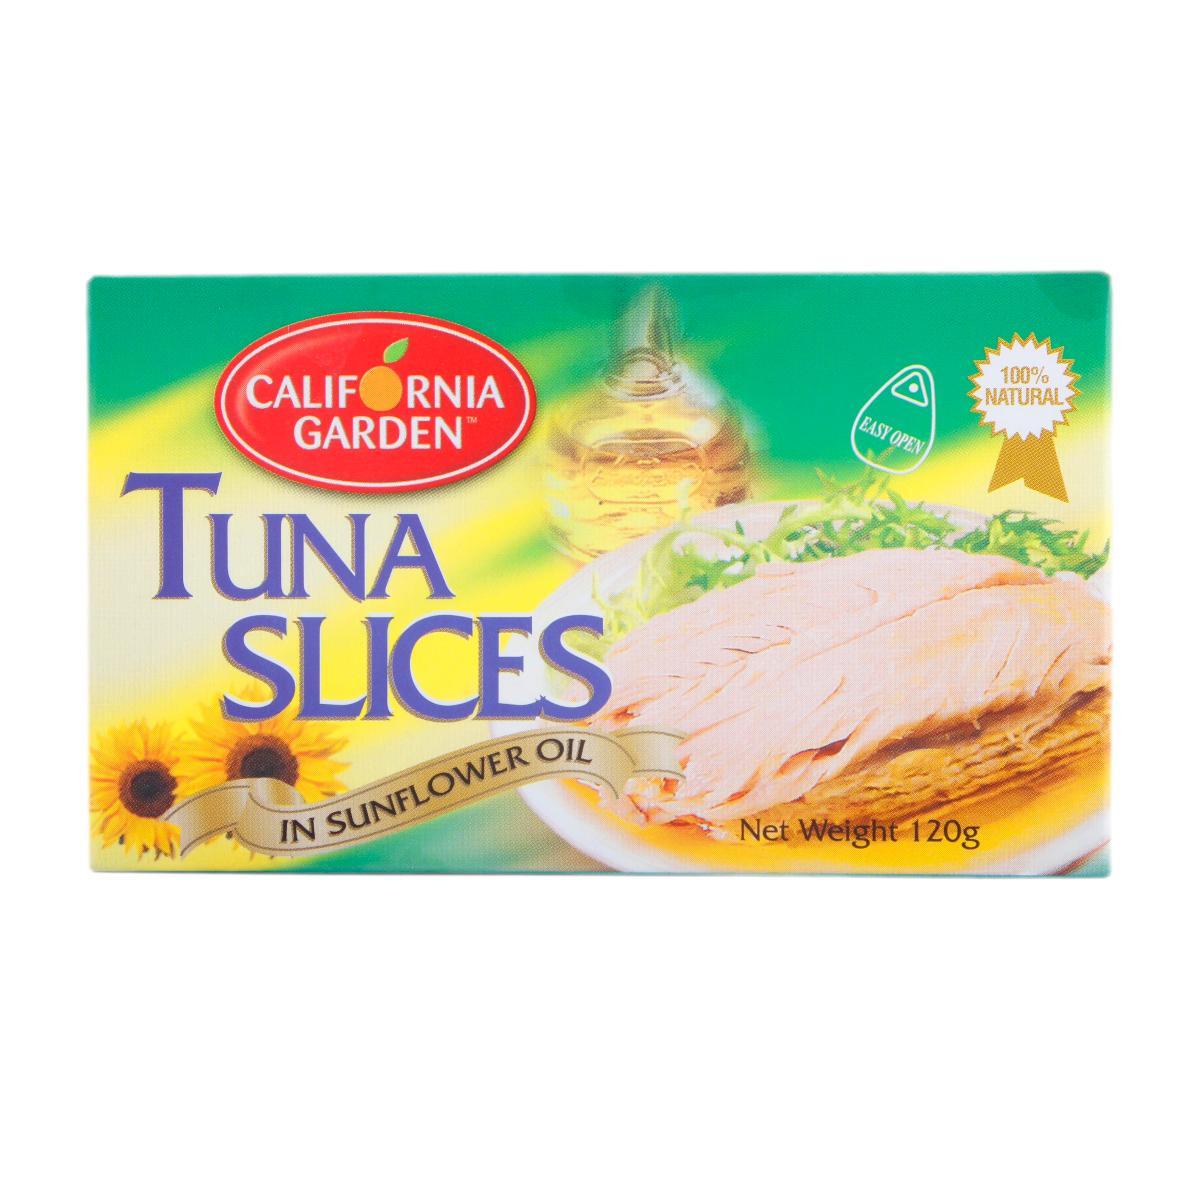 Chicken of the Sea® Unveils World's First Deli-Ready Tuna Slices